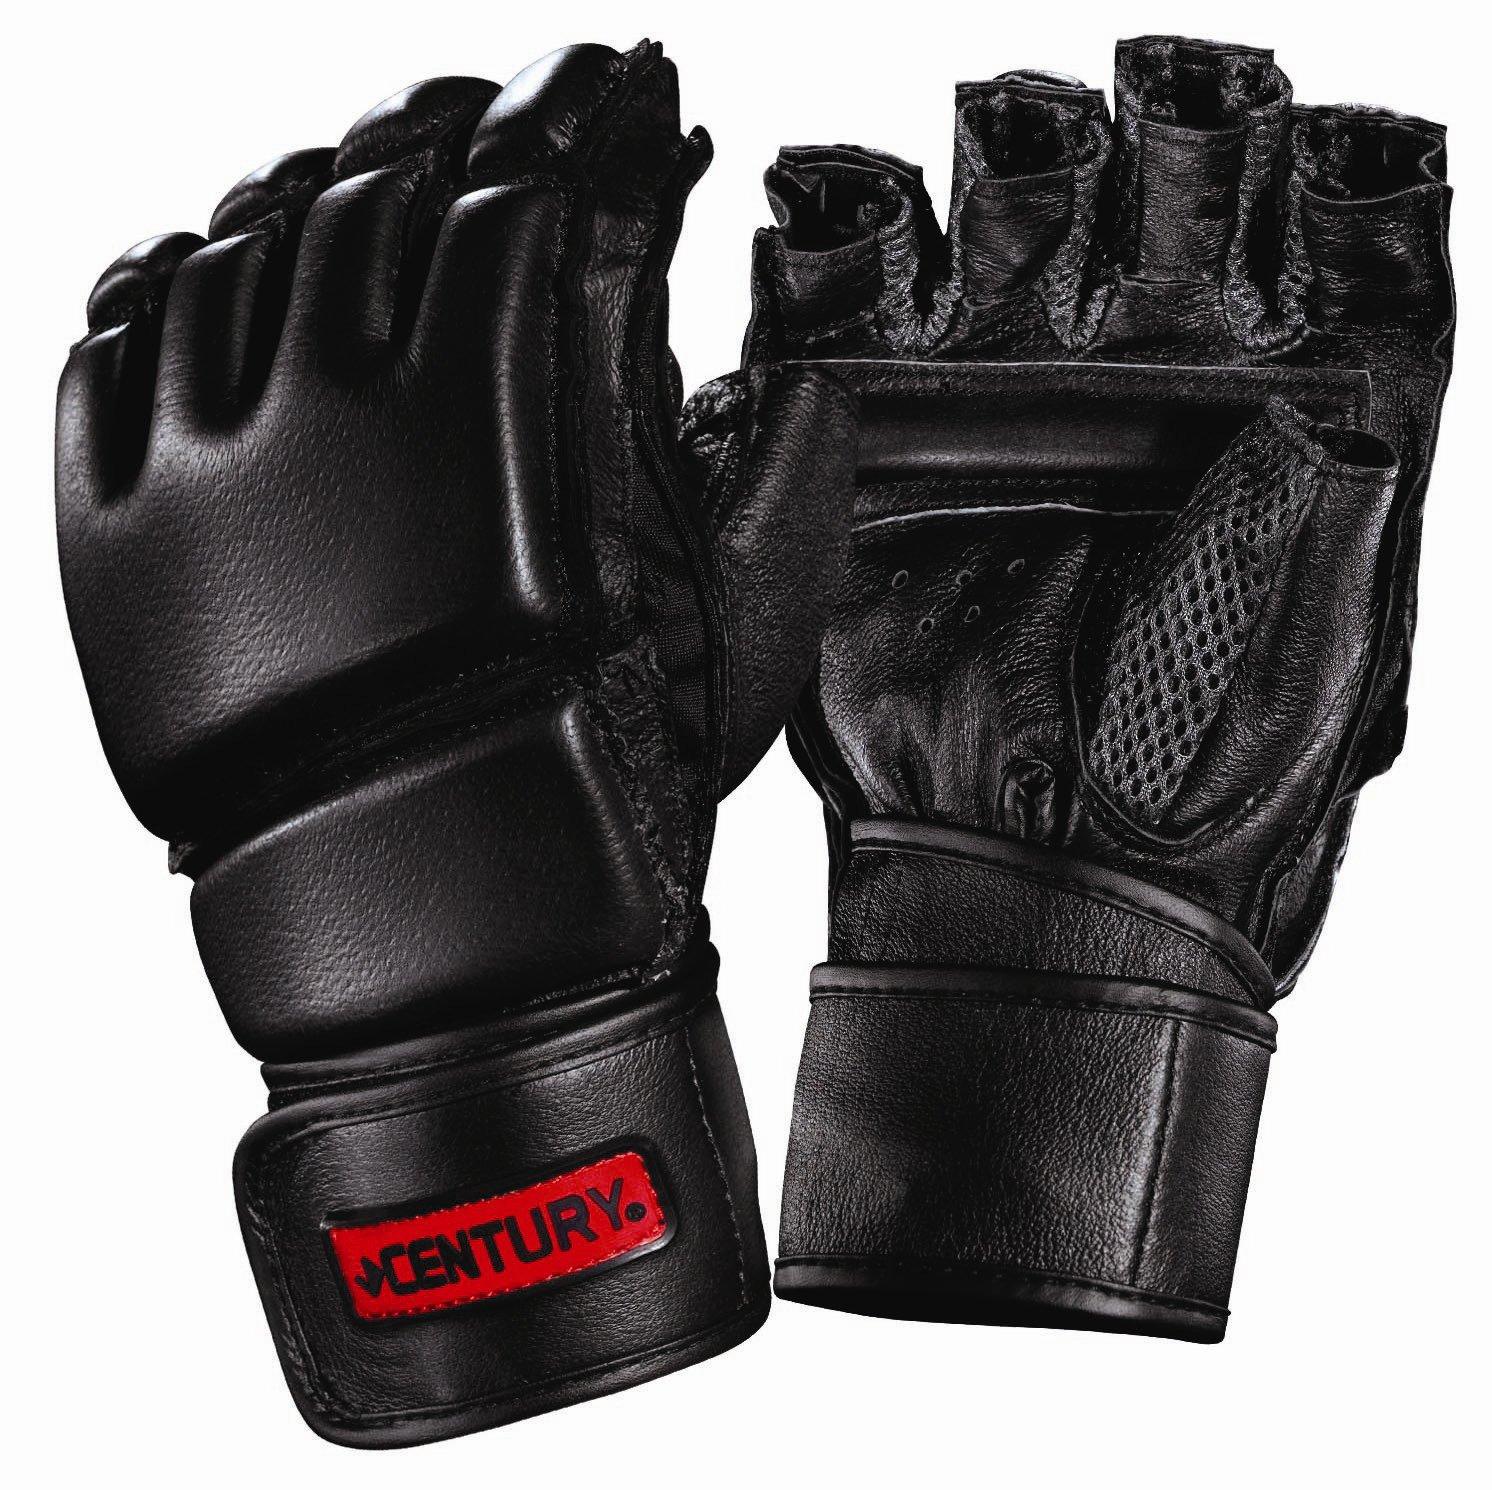 Century® Men's Leather Wrap Bag Gloves